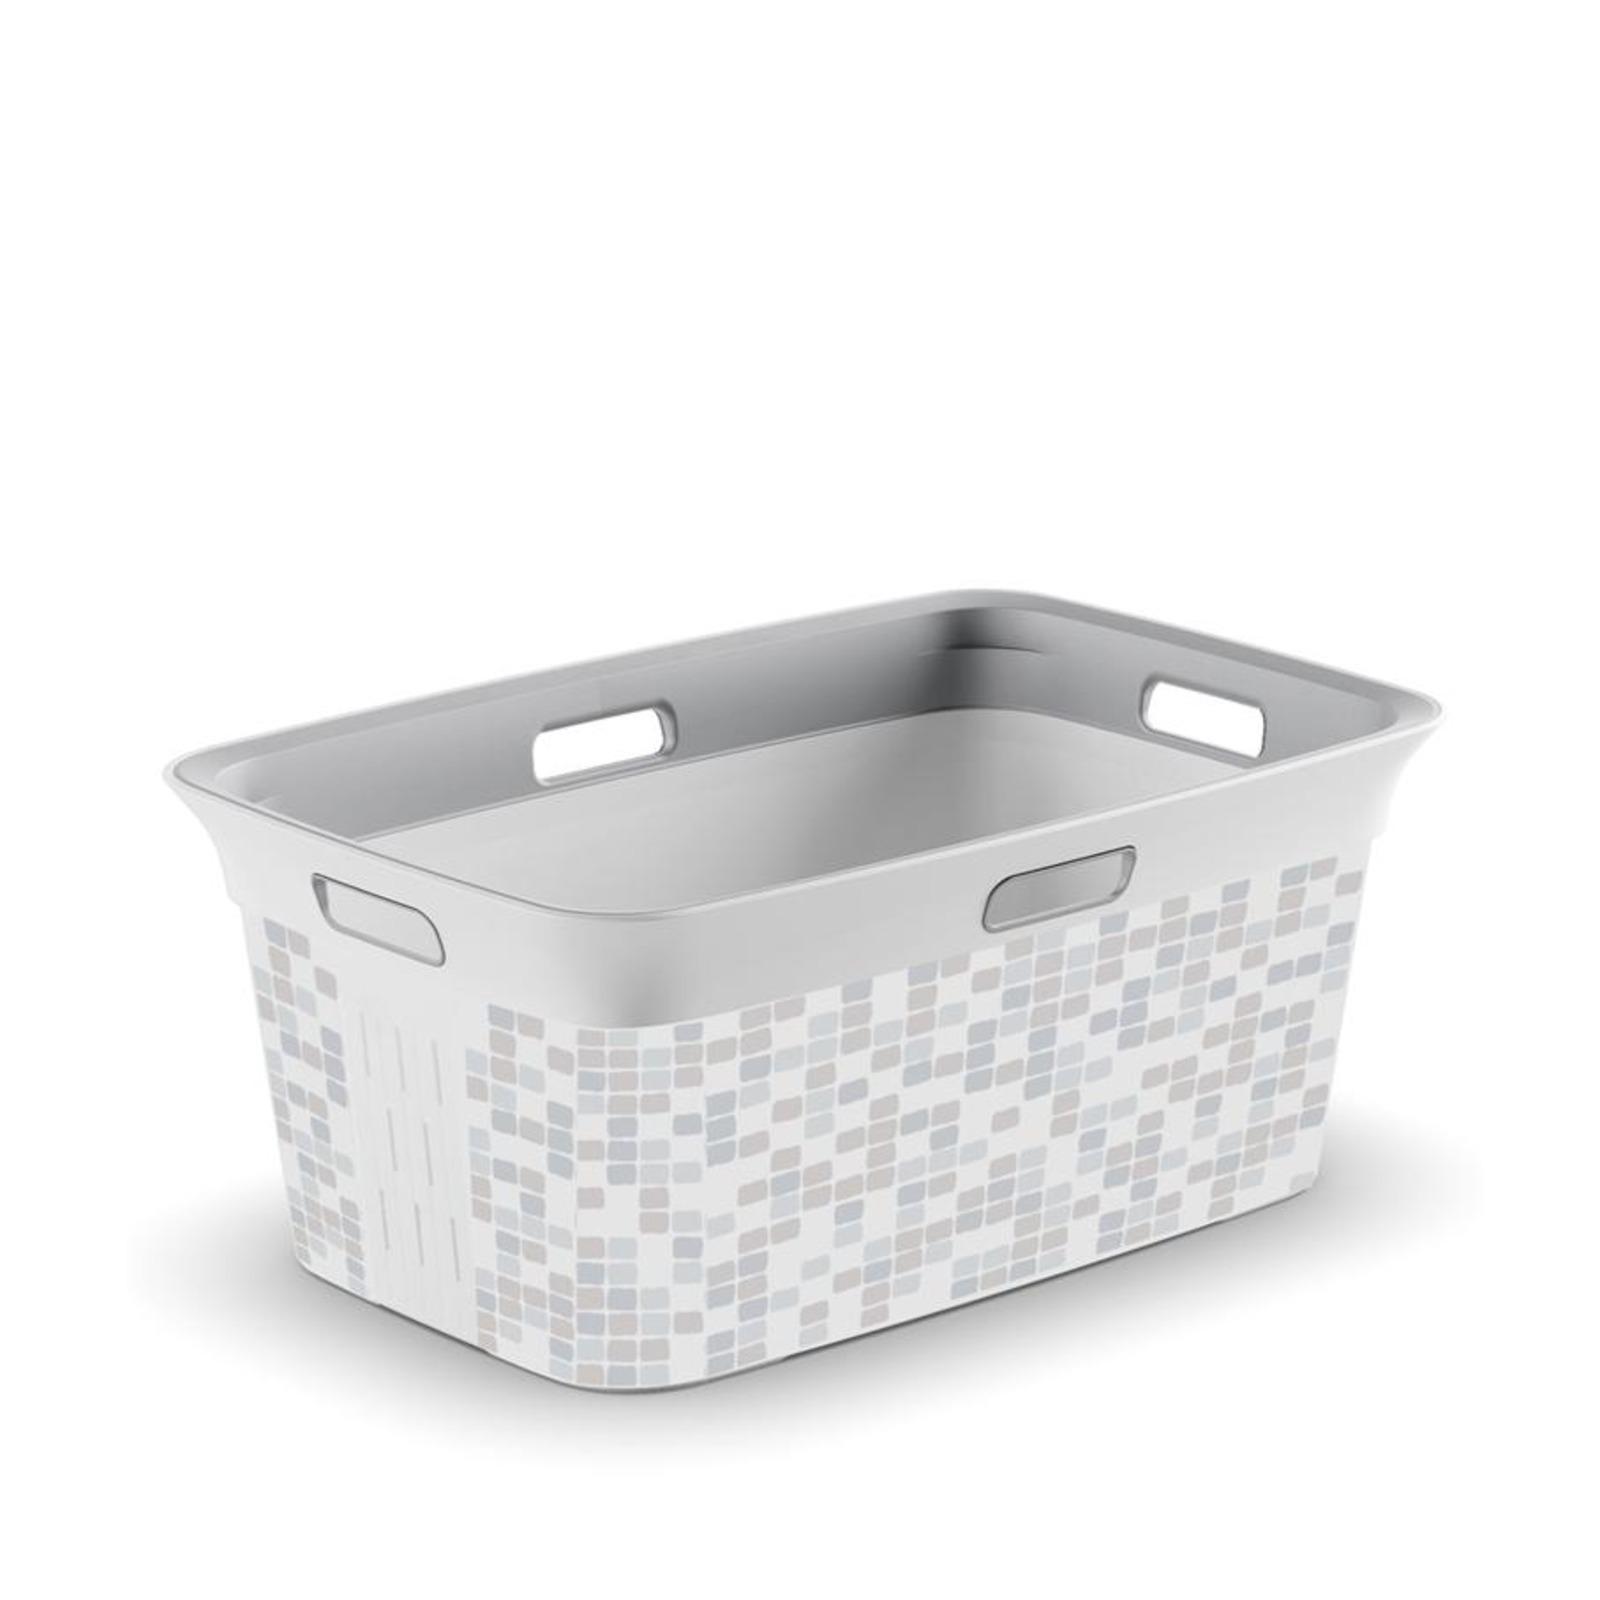 KIS Chic Laundry Basket Mosaic 45L